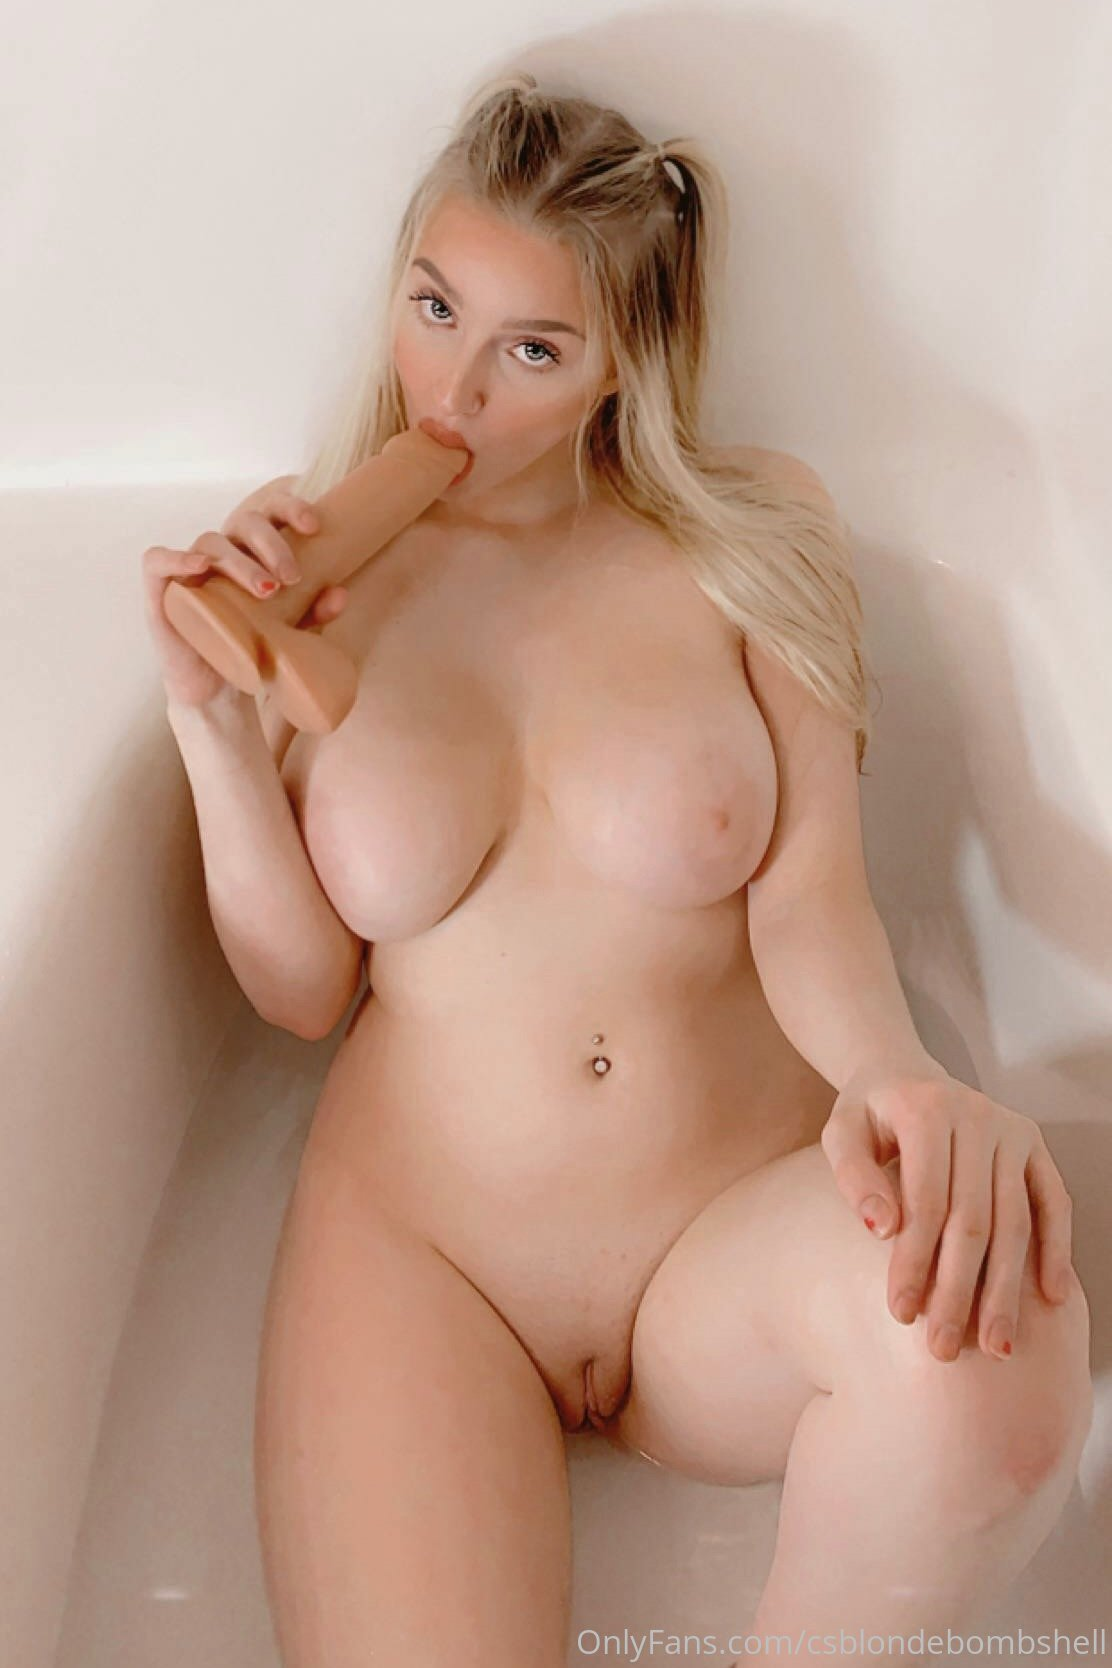 Watch Cas Summer Csblondebombshell Nude Dildo Onlyfans Leaked